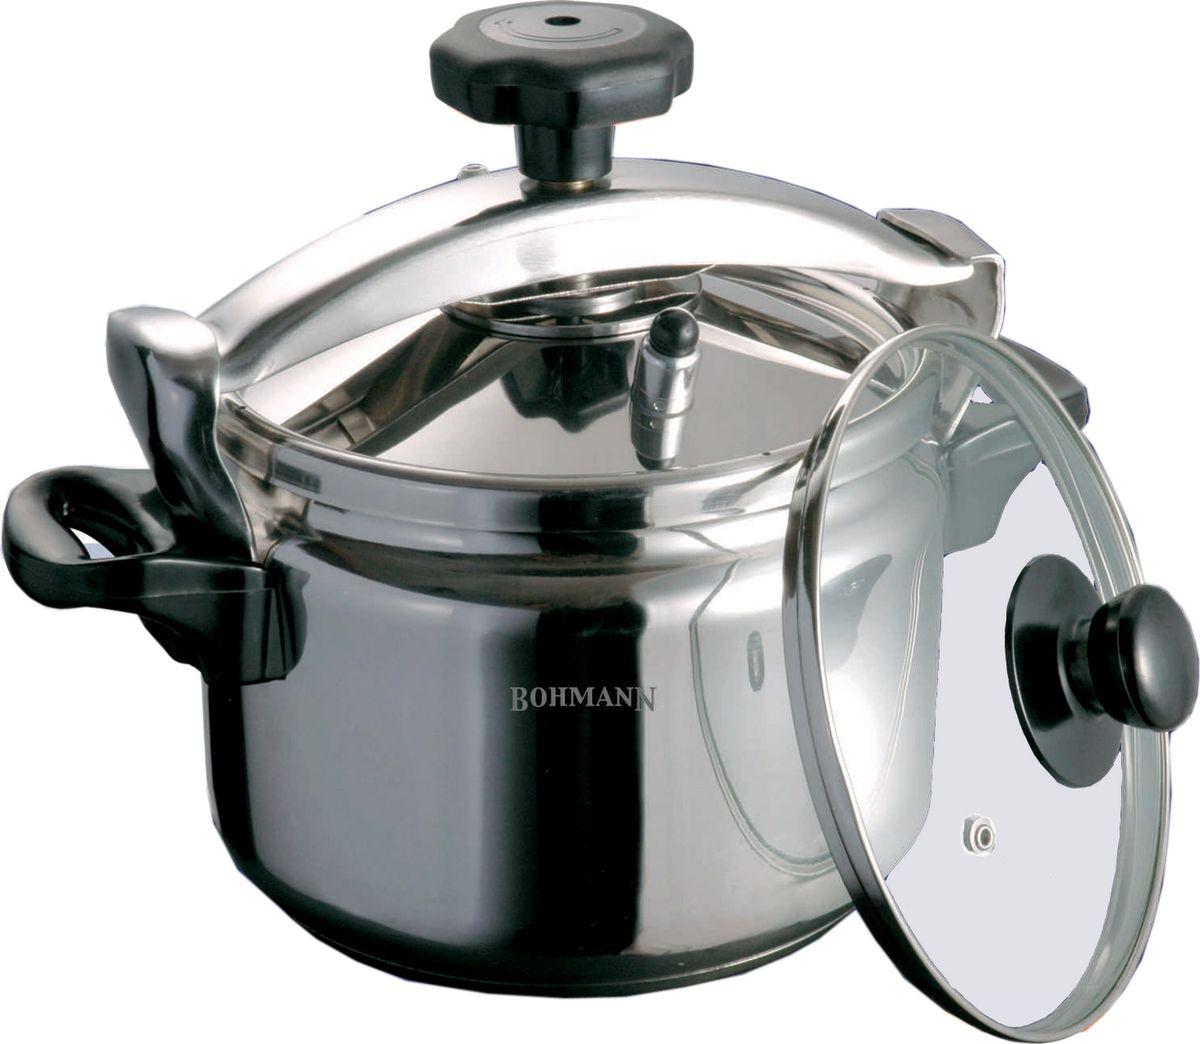 Скороварка  Bohmann , 7 л. 3507BHNEW/6 - Посуда для приготовления